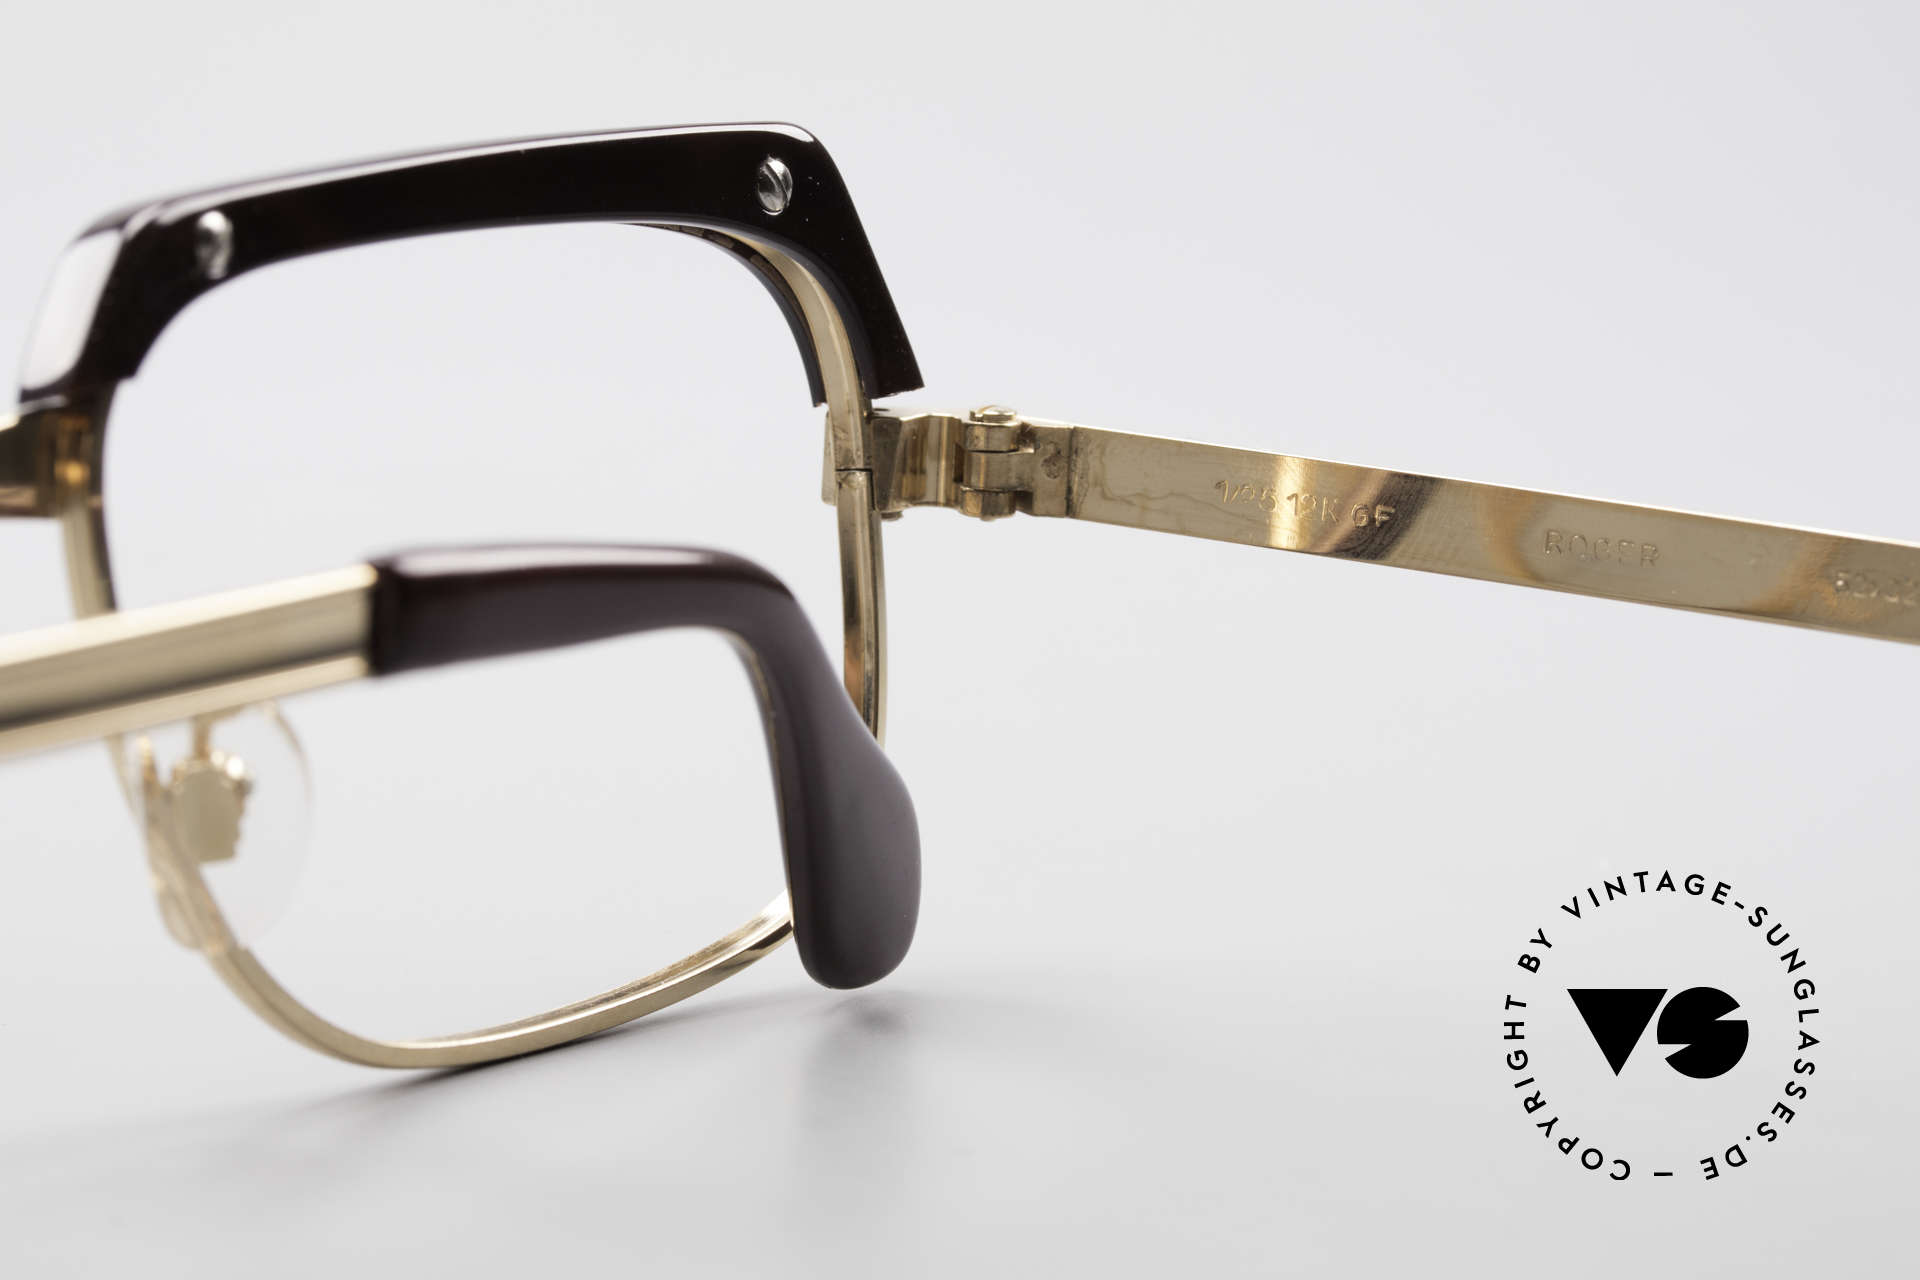 Selecta - Dalai Lama Pure Gold Filled Frame 70's, NO RETRO EYEWEAR, but a genuine old 1970's Original, Made for Men